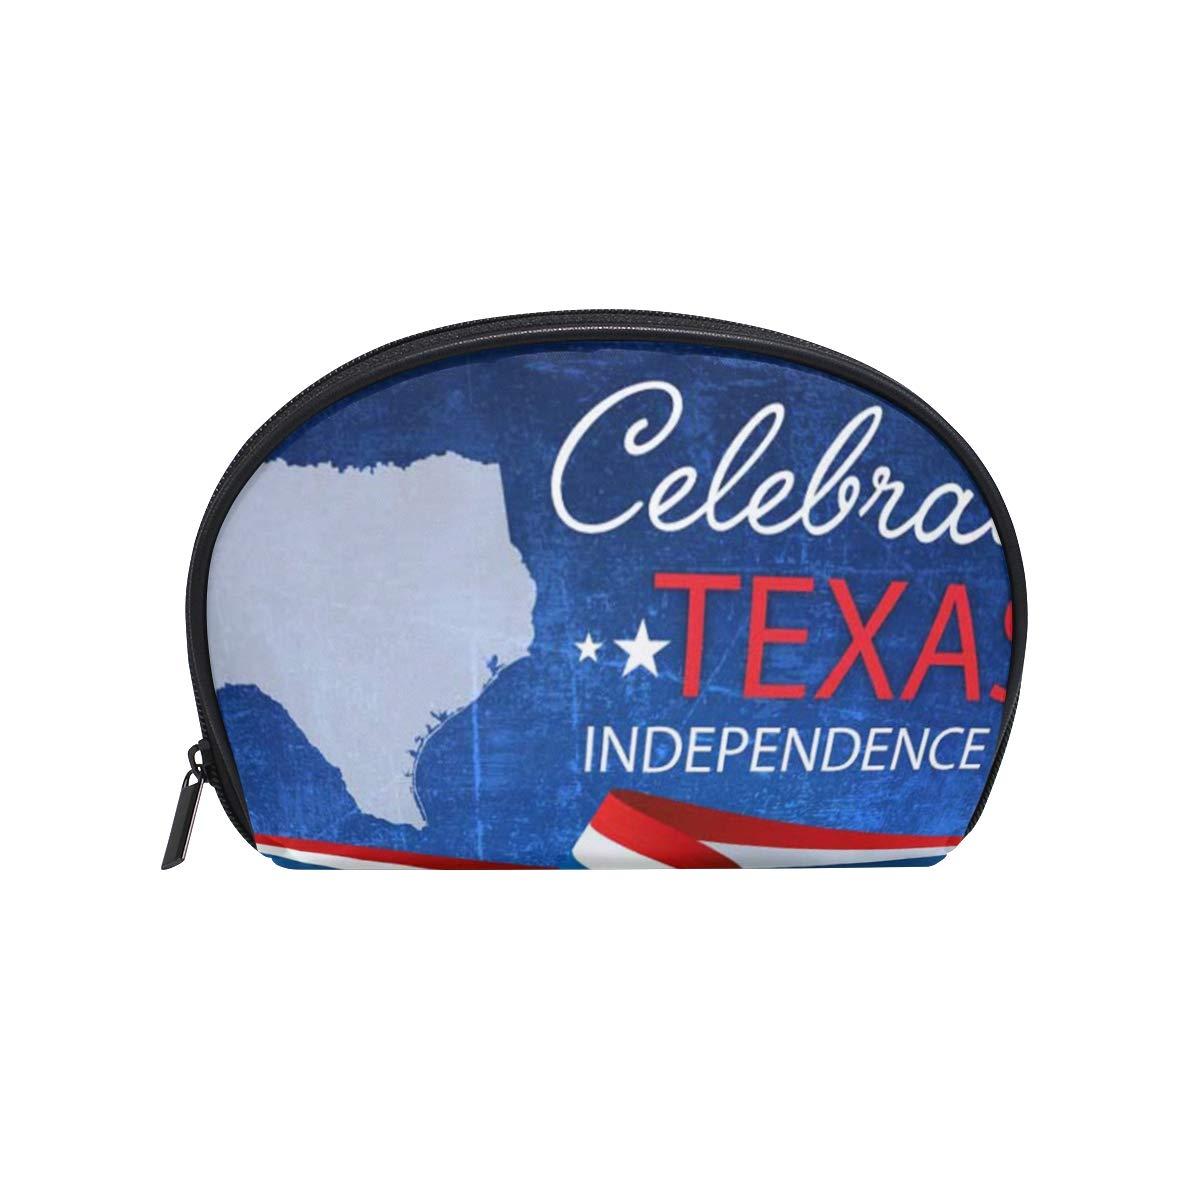 Texas Beauty Cases